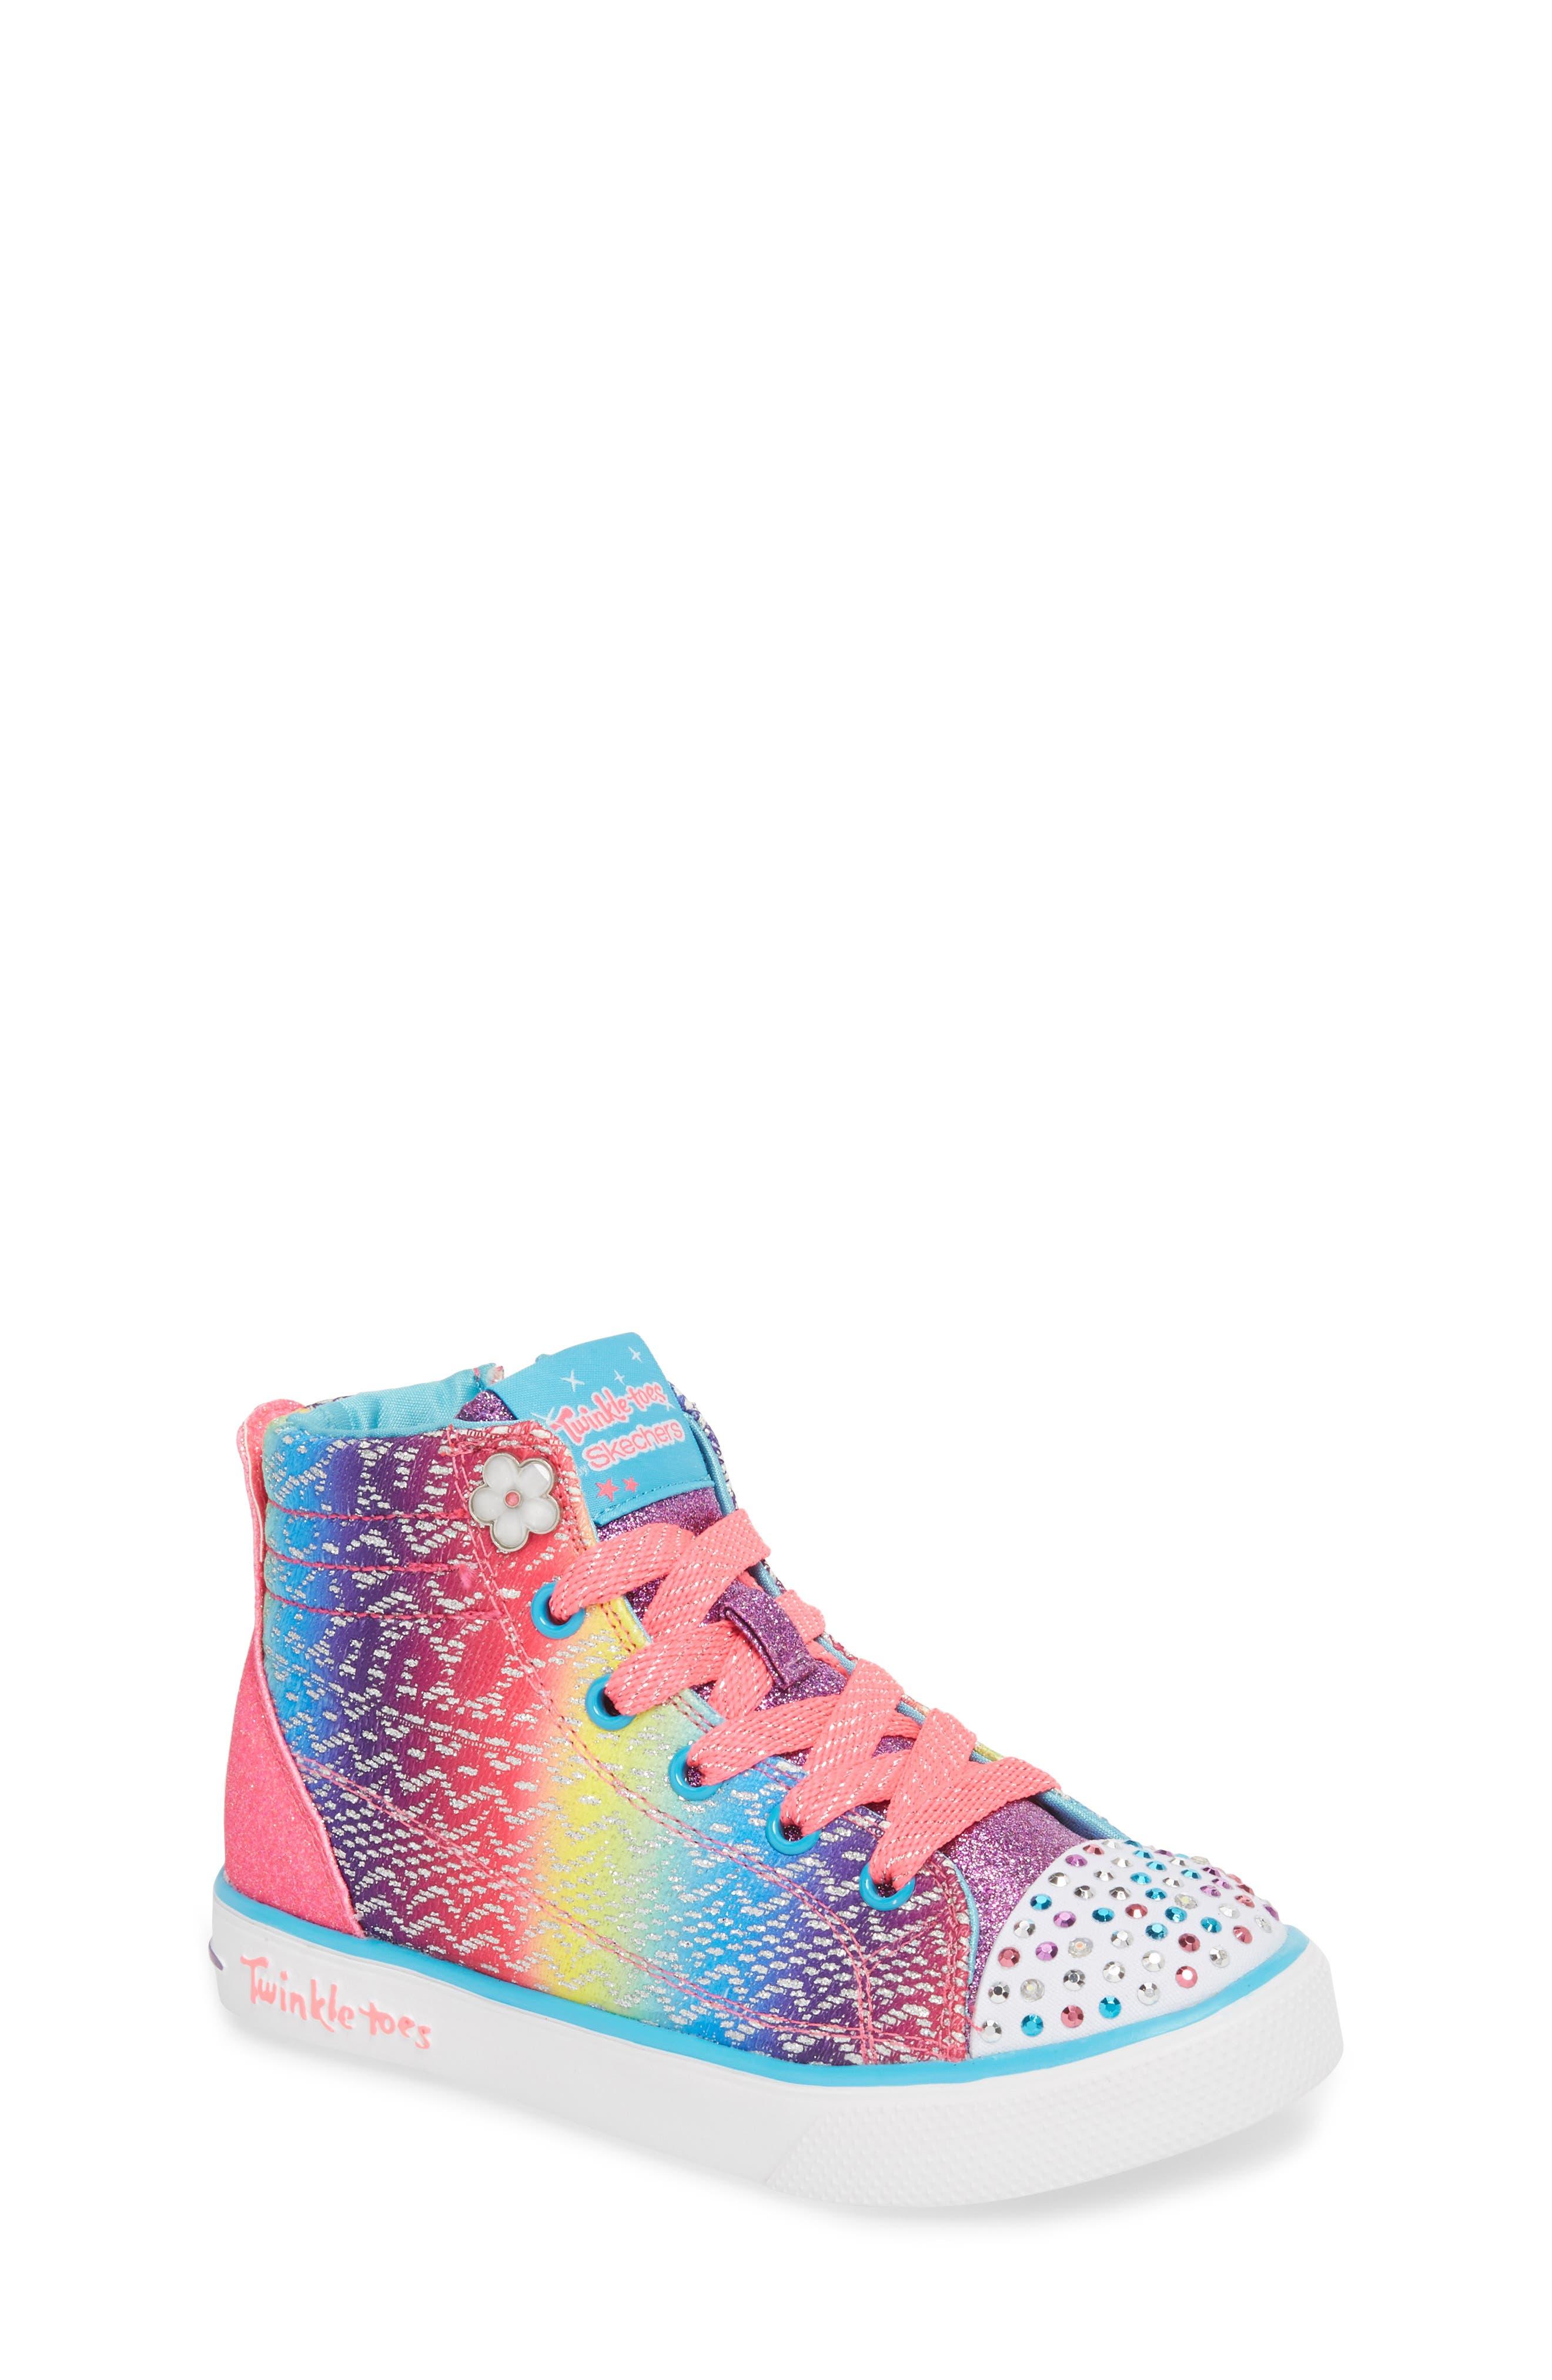 Alternate Image 1 Selected - SKECHERS Twinkle Toes Breeze 2.0 Light-Up High Top Sneaker (Toddler, Little Kid & Big Kid)